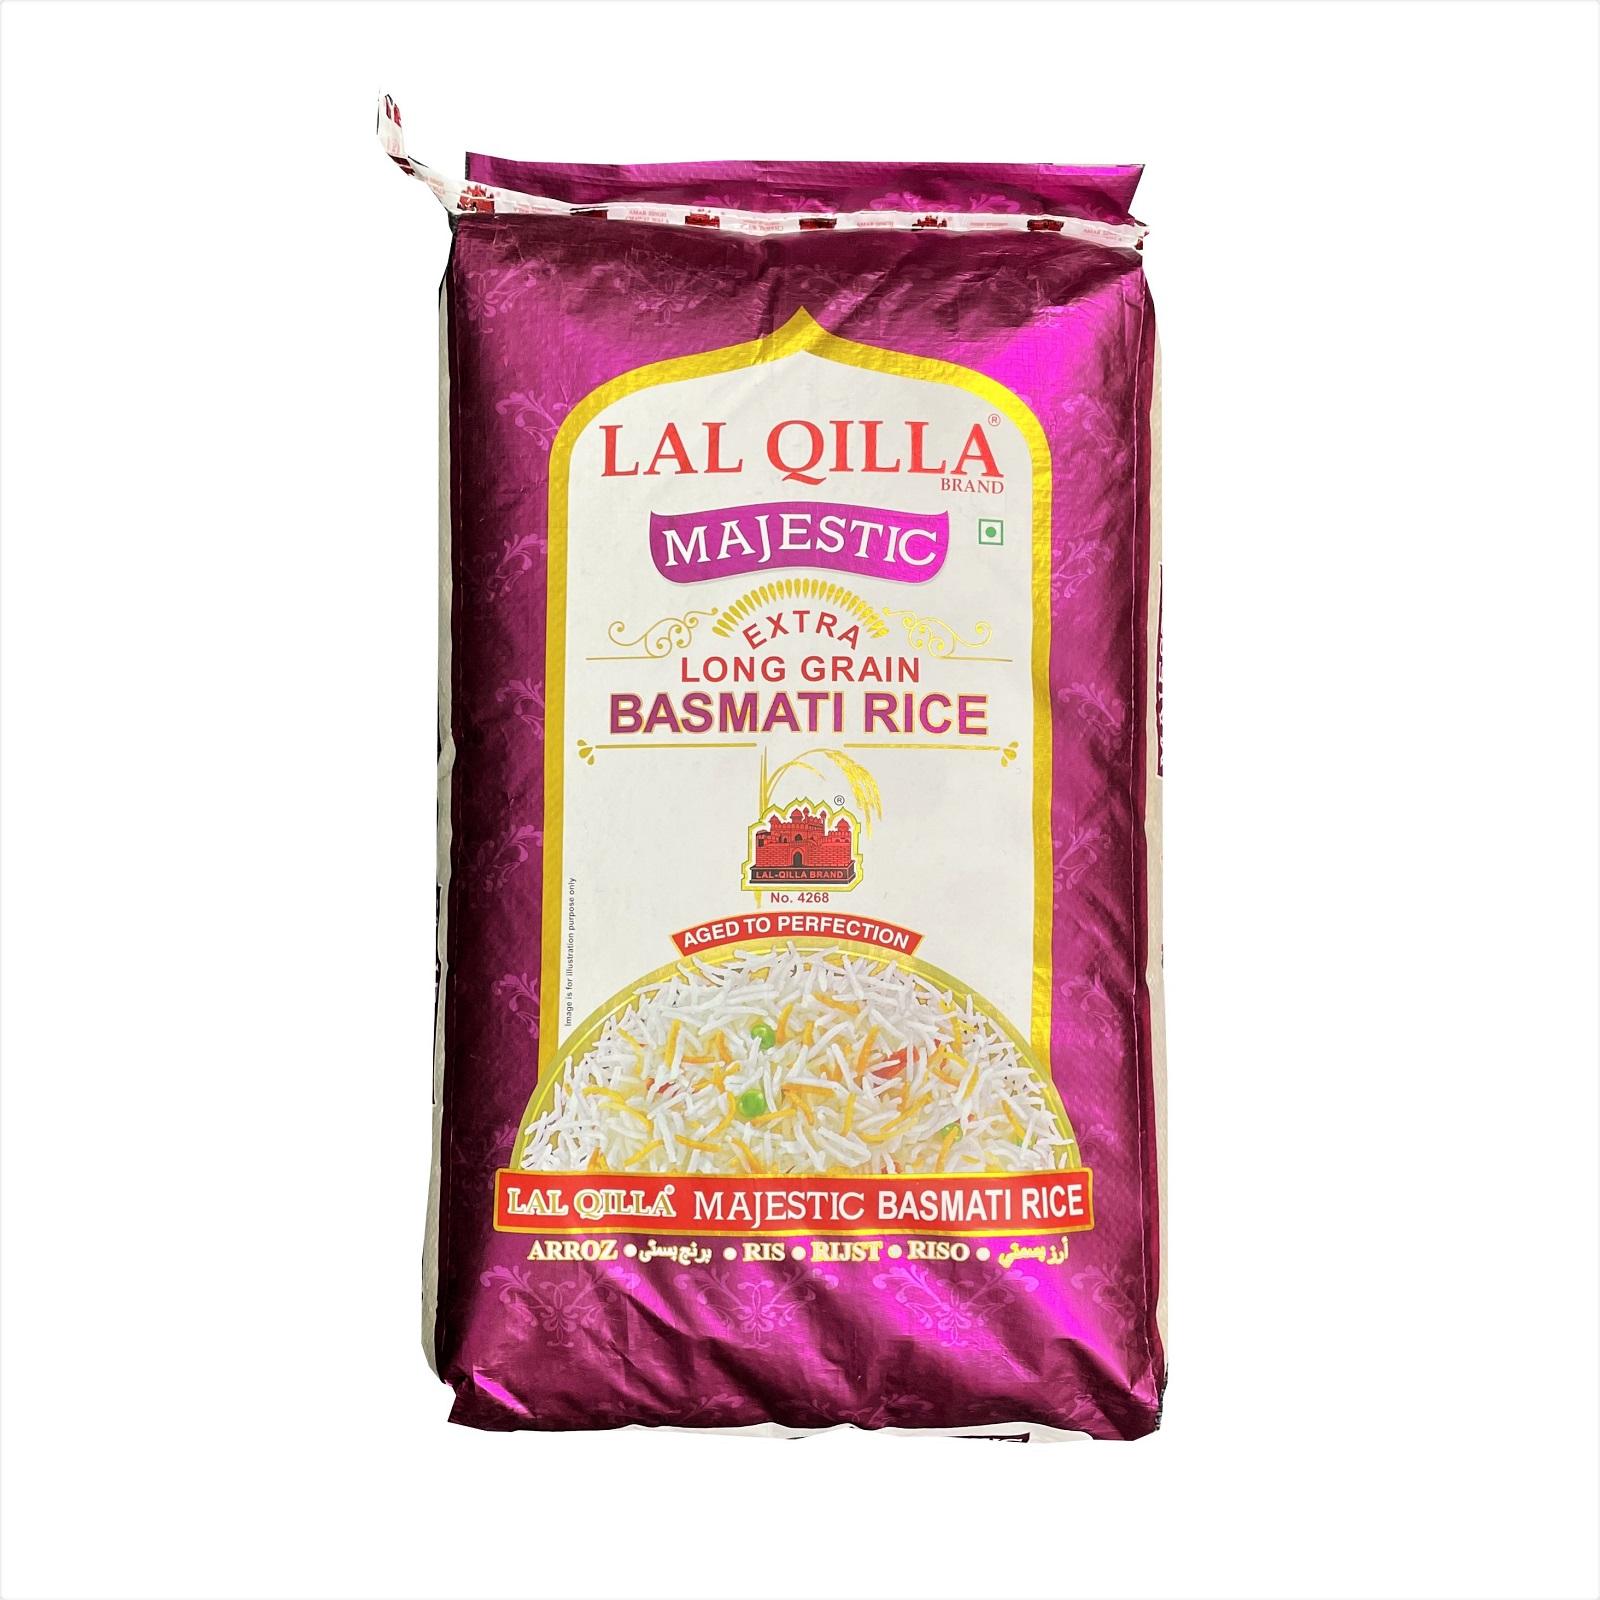 Lal Qilla Majestic Basmati Rice 20kg